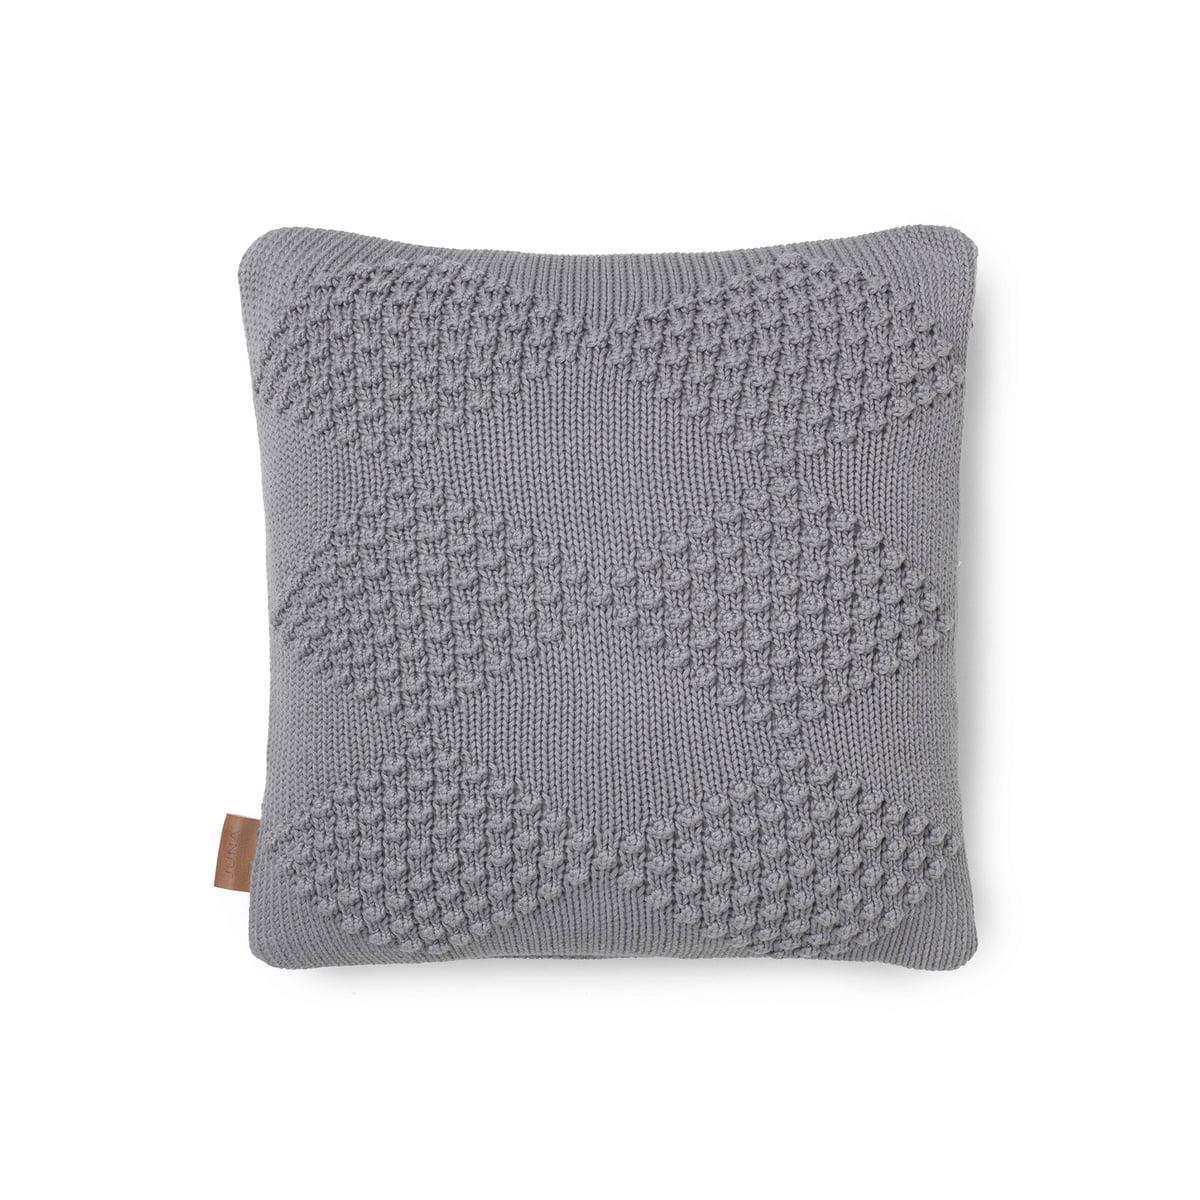 juna diamond kissen 45 x 45 cm grau grau t 45 b 45 online kaufen bei woonio. Black Bedroom Furniture Sets. Home Design Ideas